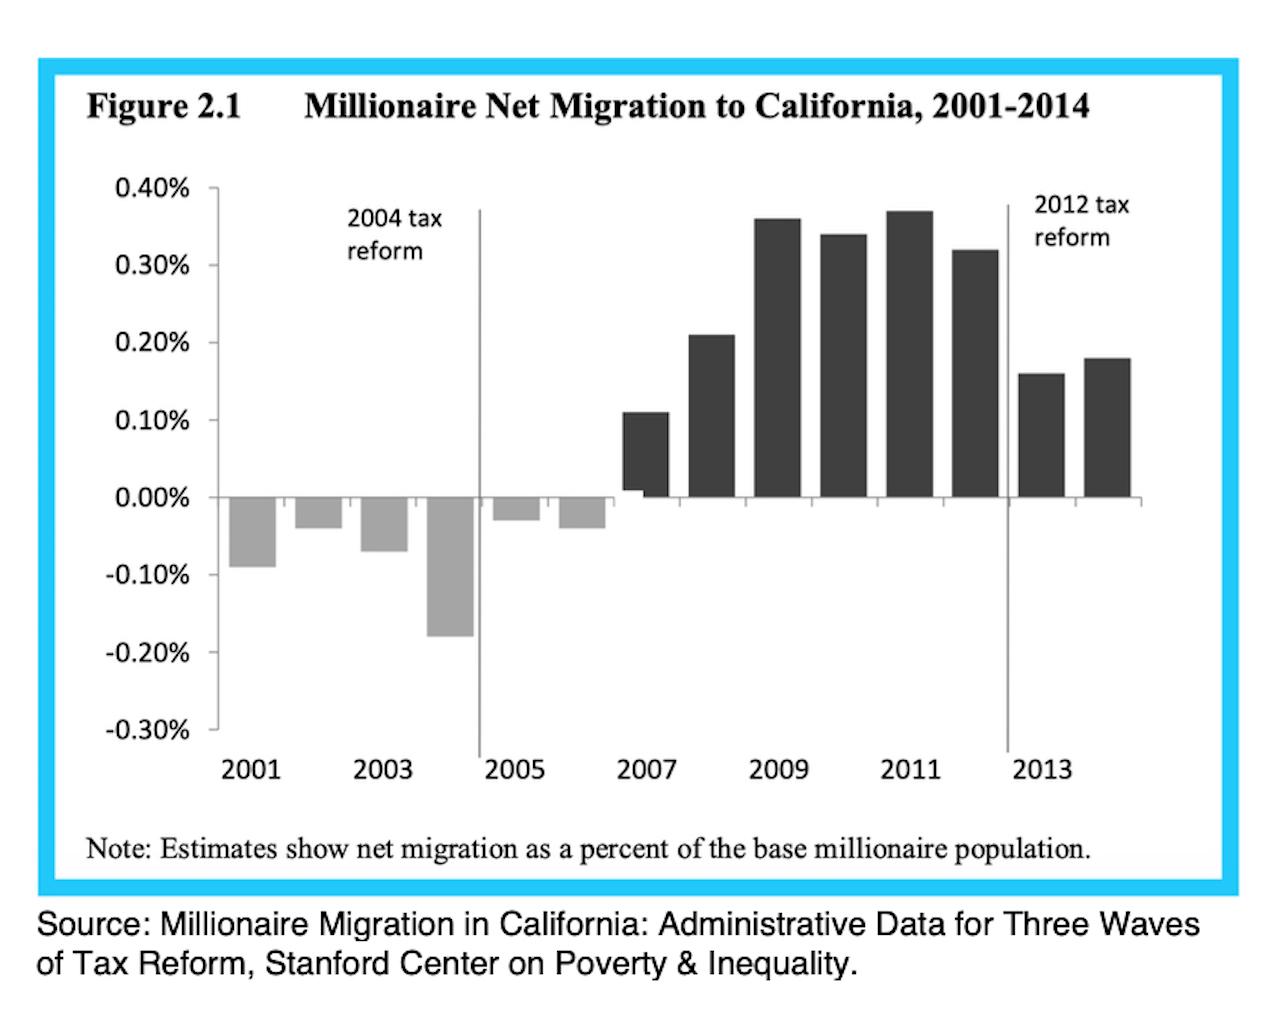 Millionaire migration in California